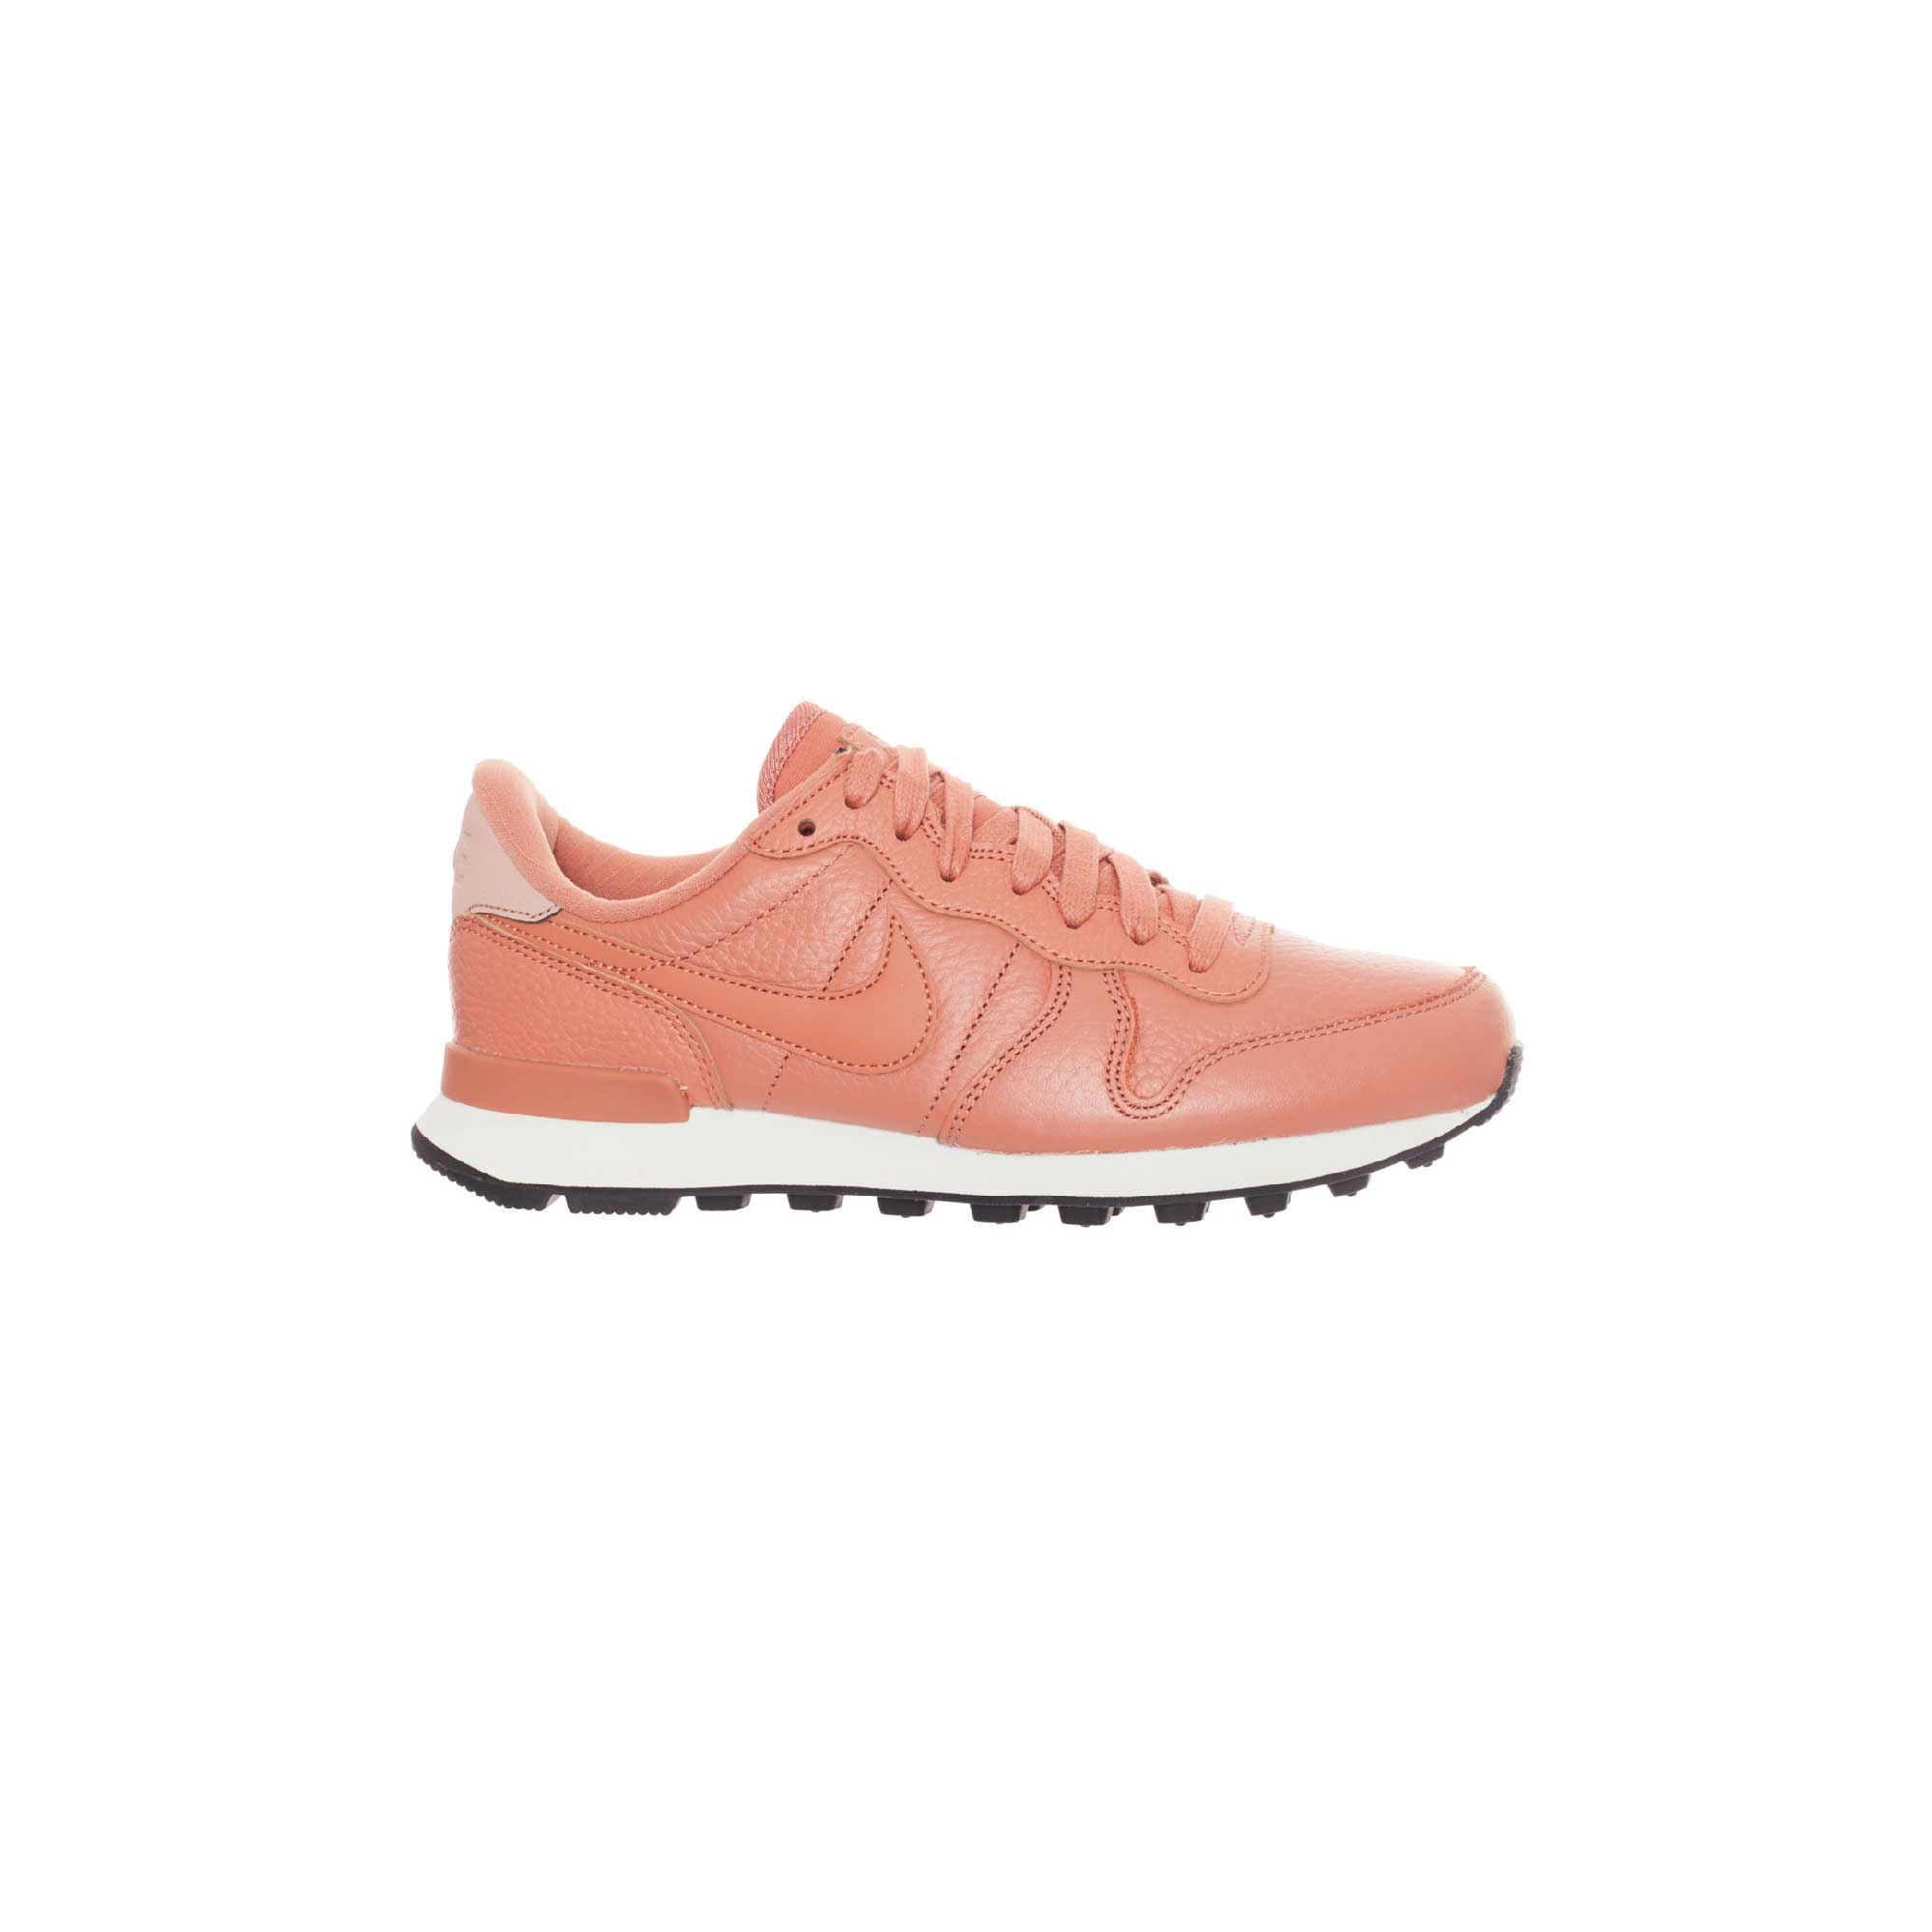 Nike 67vbfgyy Roca Village Store Factory La Tienda • c1TFKlJ